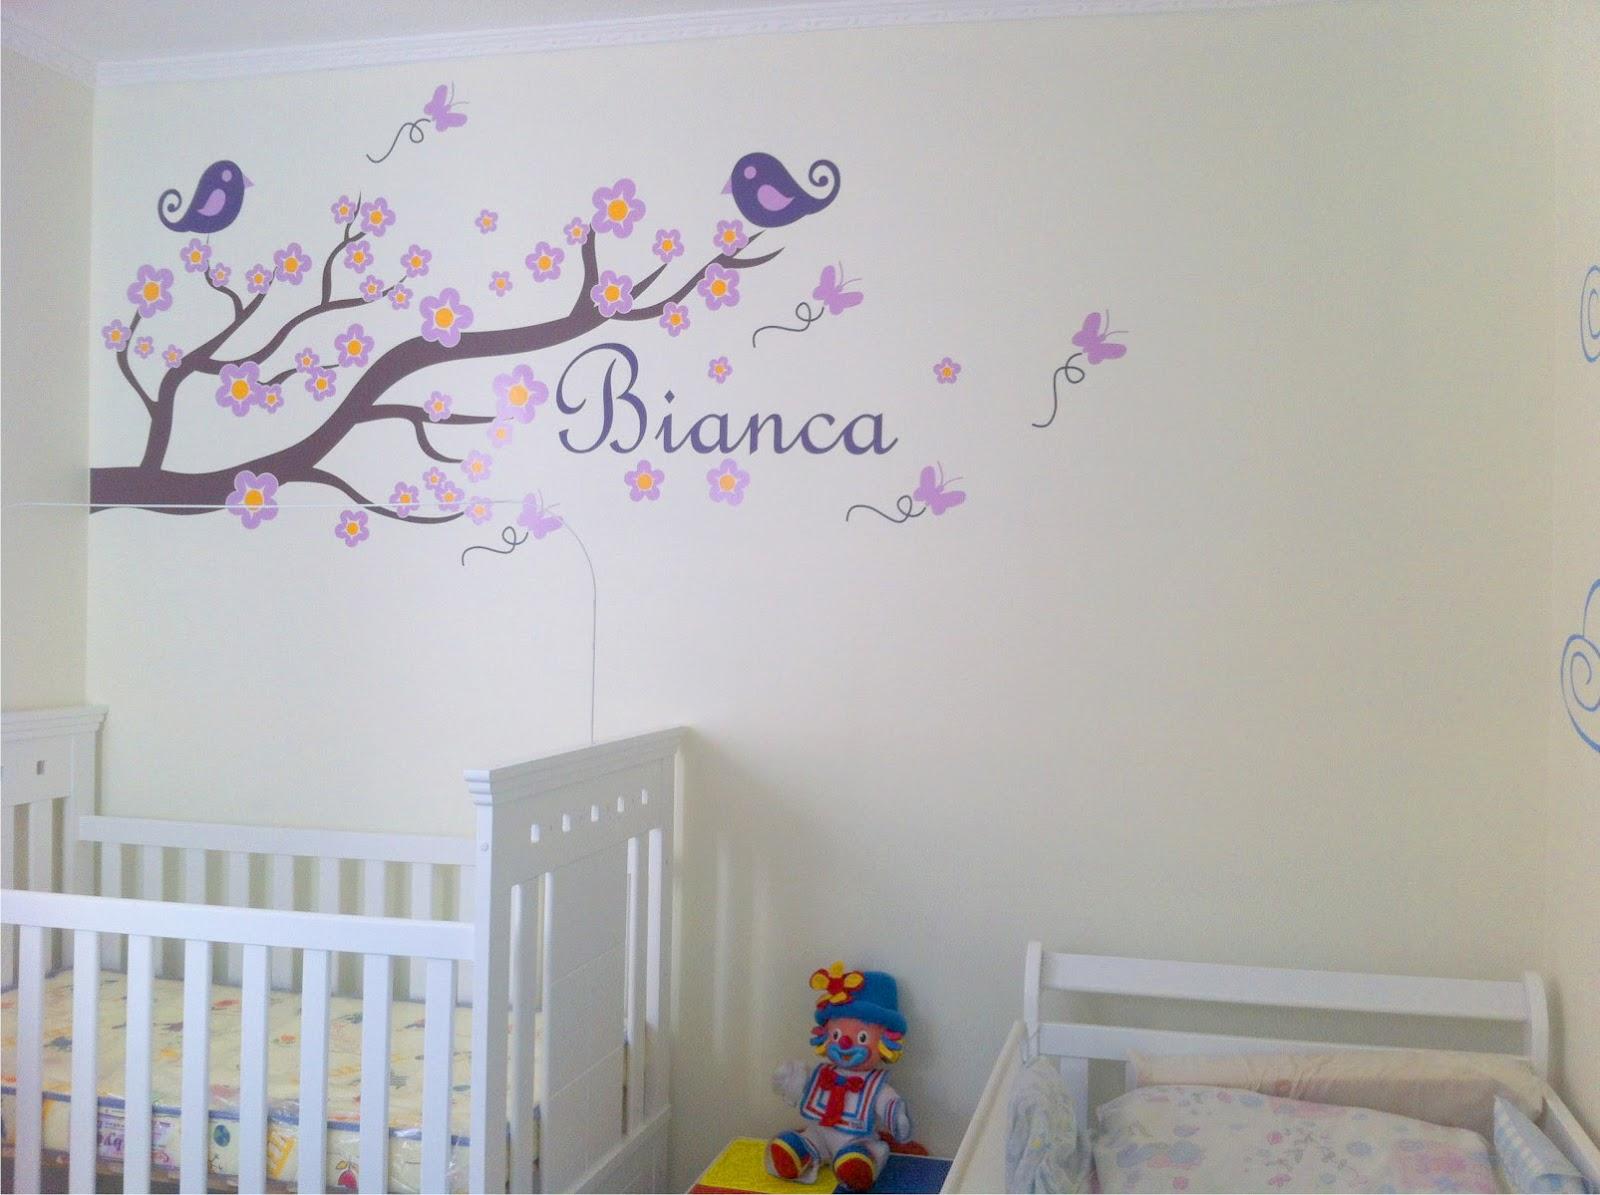 Ideias de adesivos decorativos para quarto de bebé